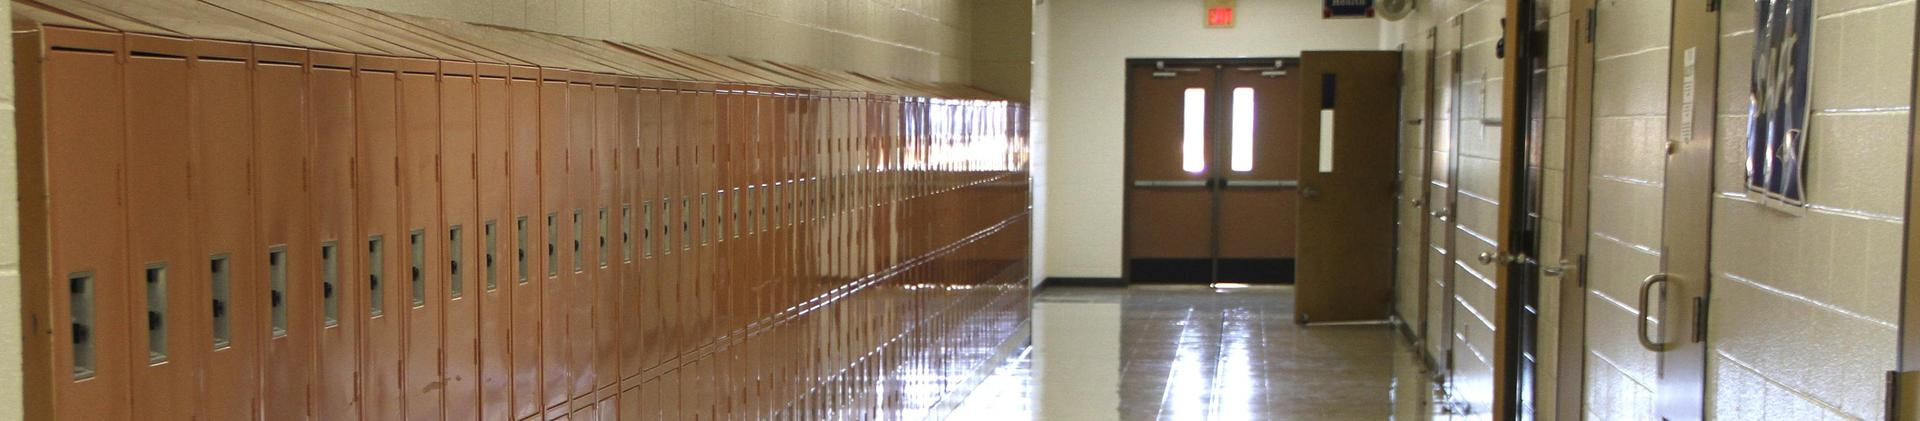 CMS hallway with lockers